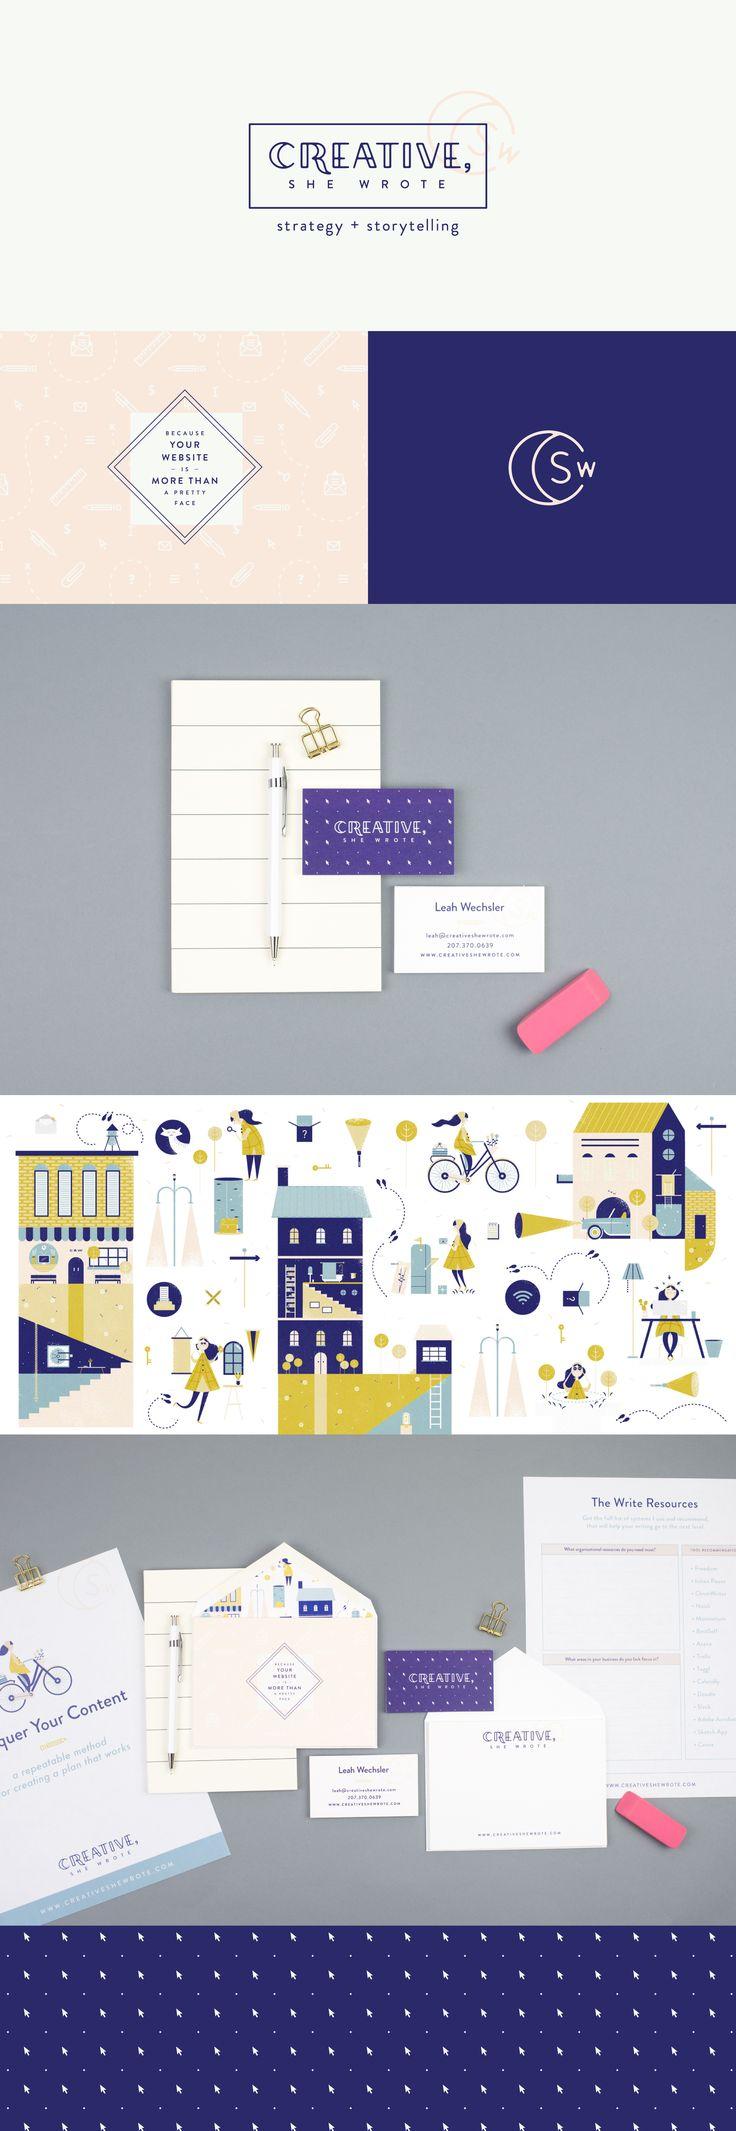 Creative, She Wrote brand identity | Spruce Rd. | logo design, illustration, content marketing, worksheet design, branding, online brand